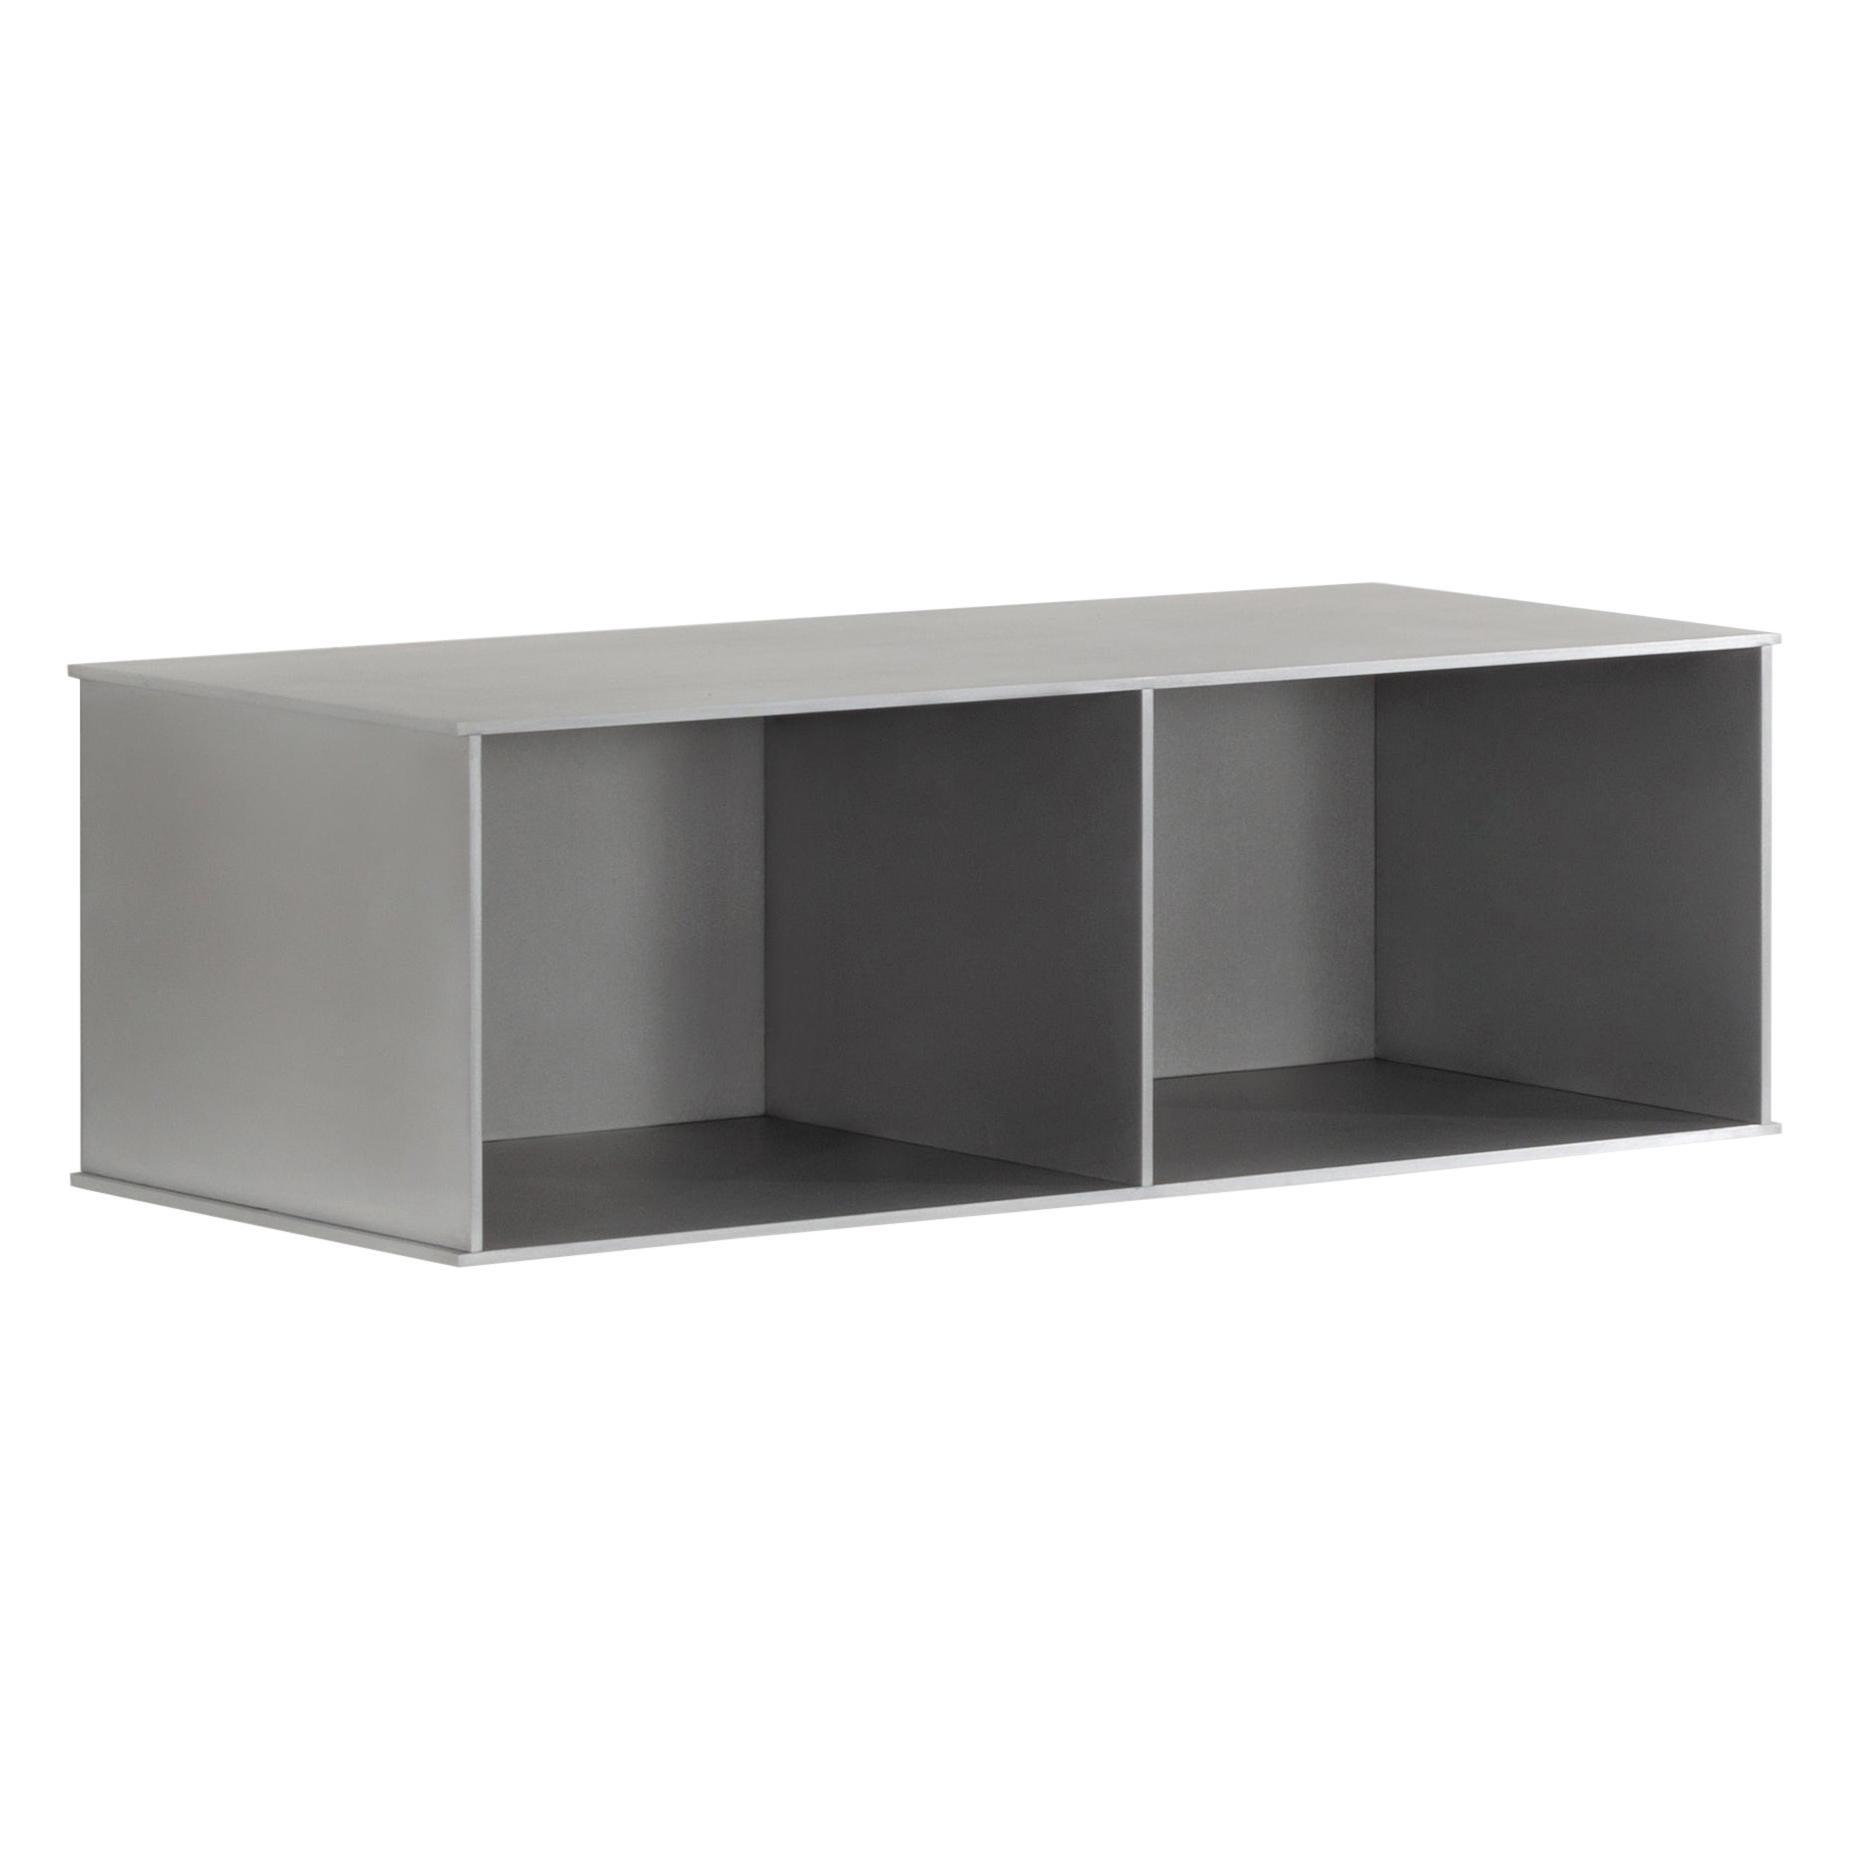 Deep 2G Wall-Mounted Shelf Console in Waxed Aluminum Plate by Jonathan Nesci